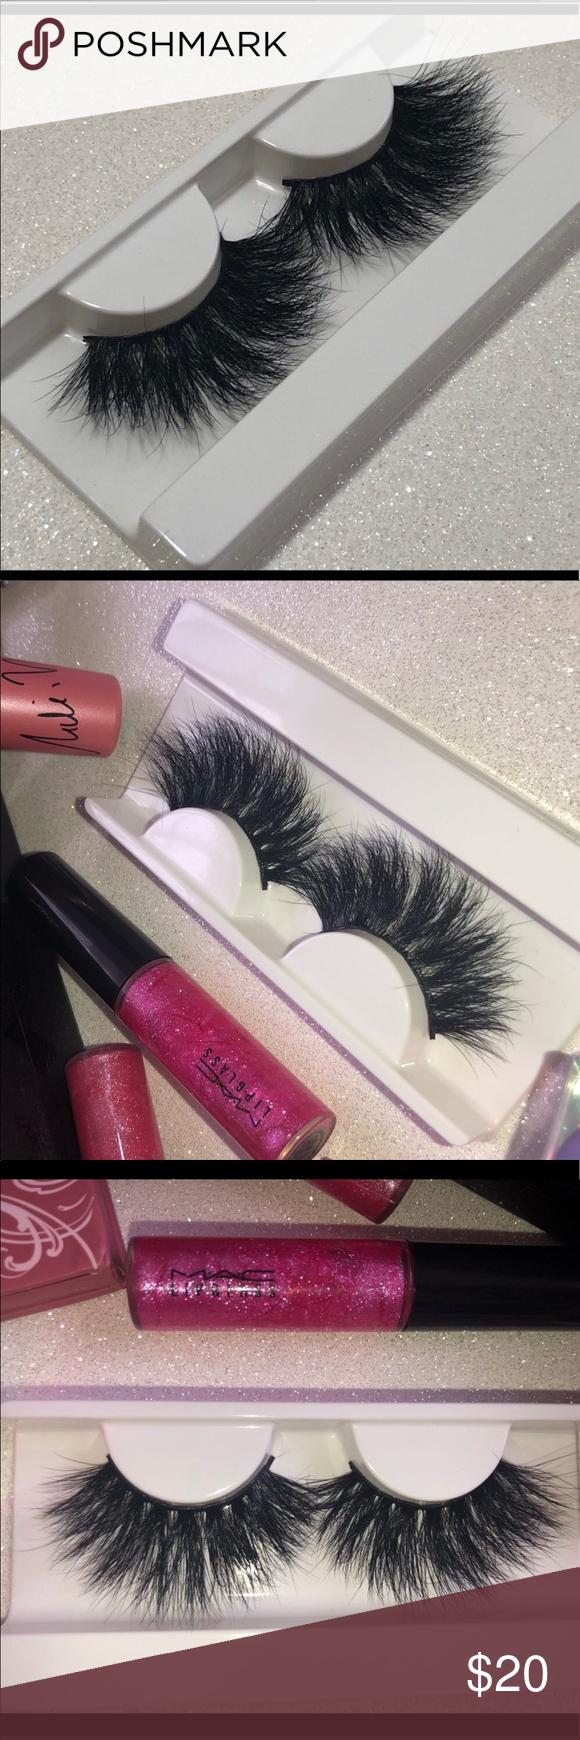 New Siberian Mink Wispy Eyelashes New! a